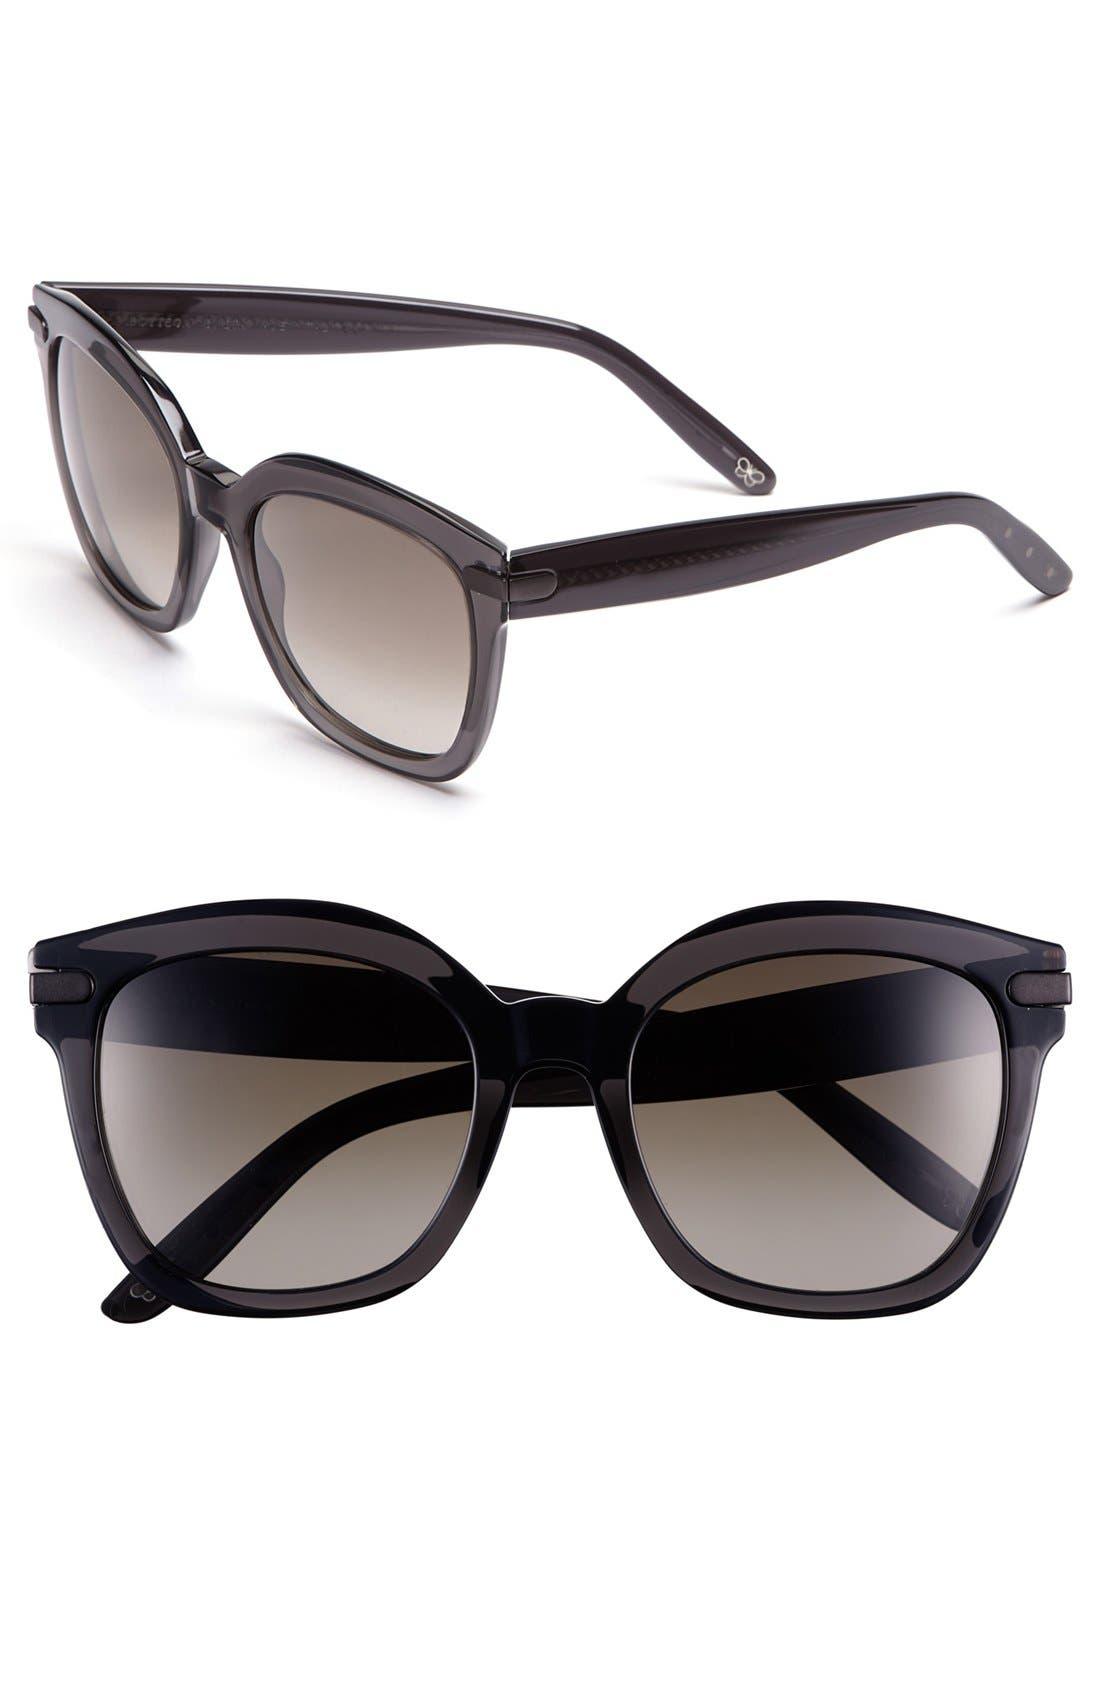 Main Image - Bottega Veneta 53mm Sunglasses